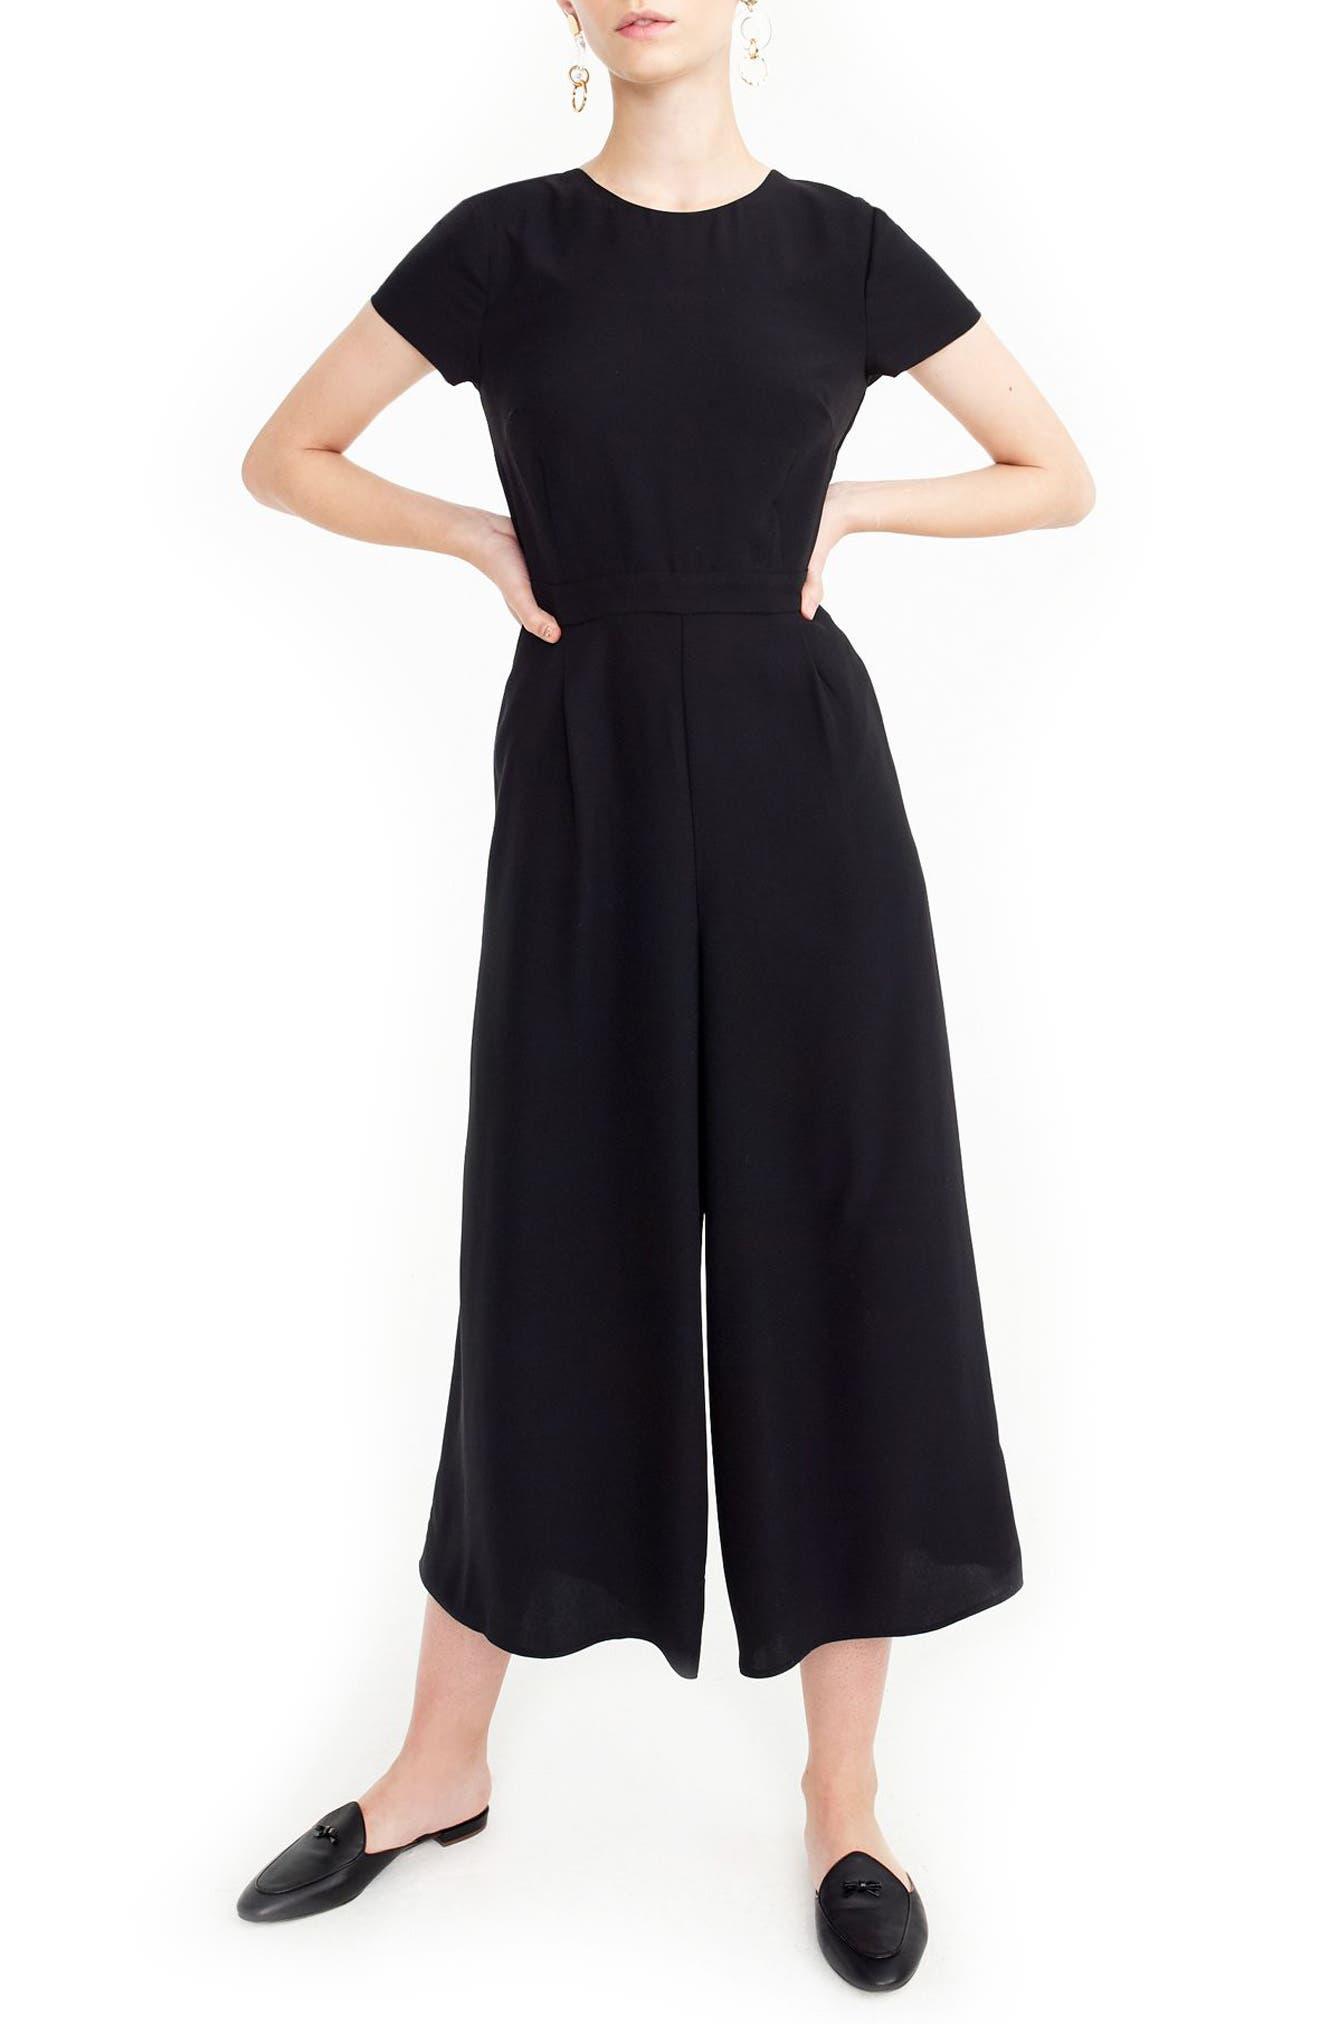 0a967cee84 Women s J.Crew Dresses